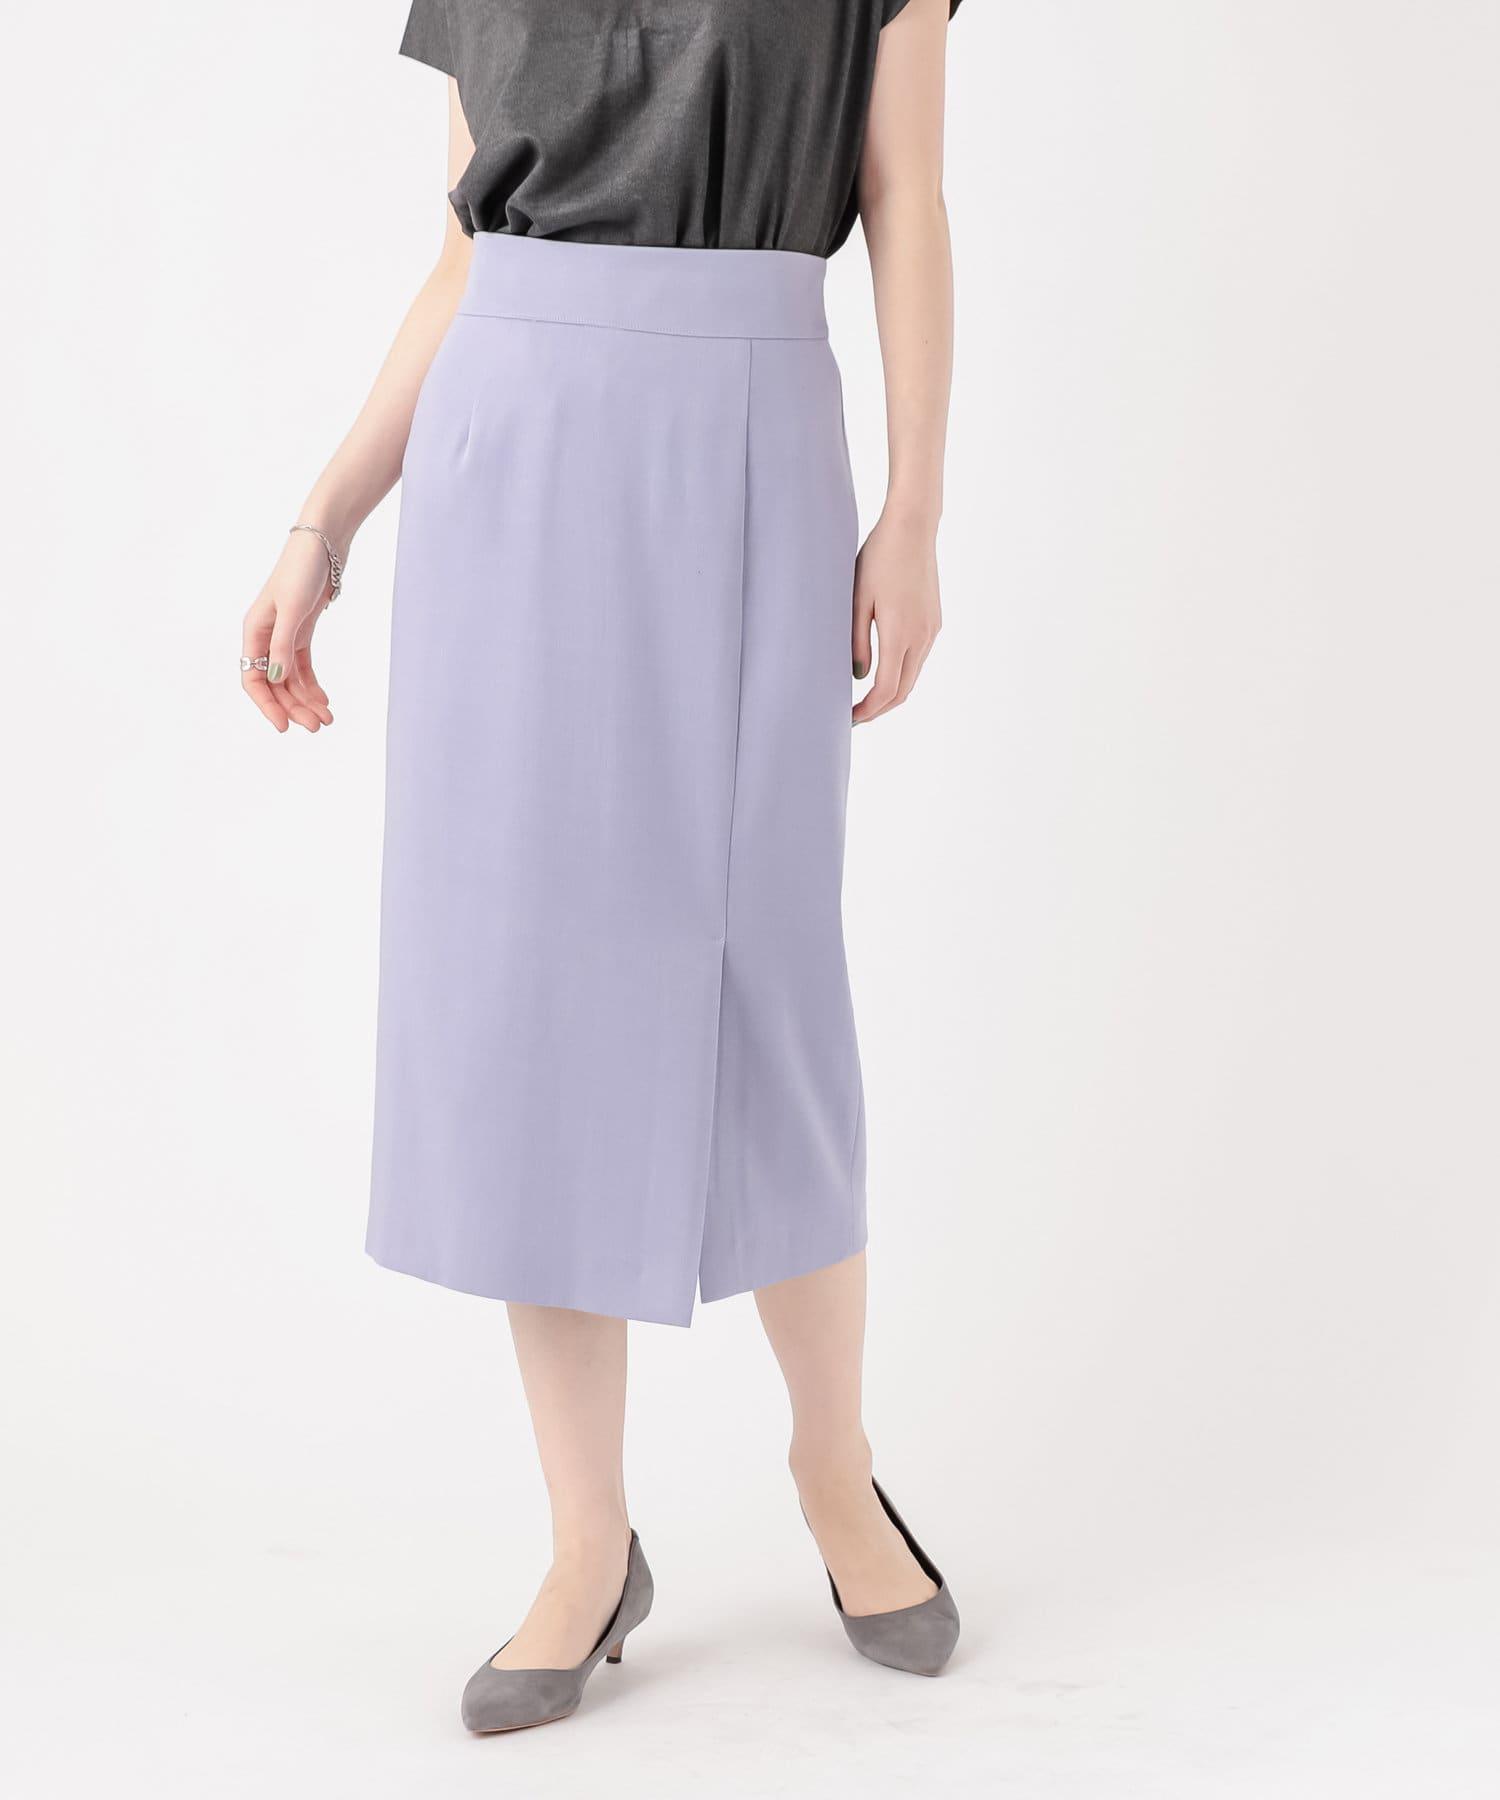 RIVE DROITE(リヴドロワ) 【ON/OFF着回し抜群な一枚】タックタイトスカート